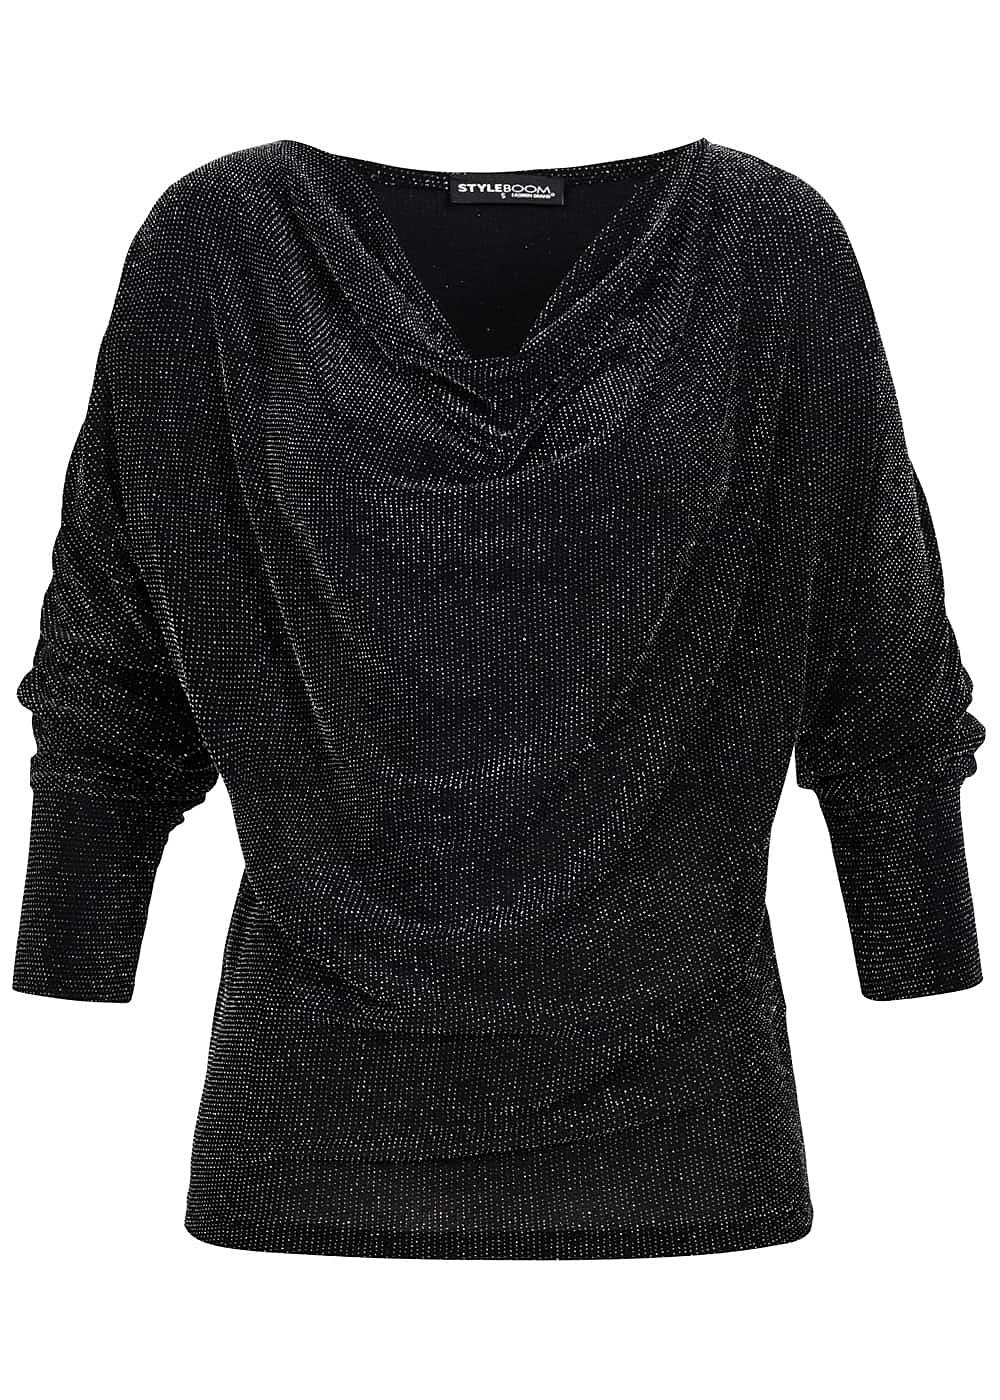 2a8dd4eeb41a Styleboom Fashion Damen Shirt Wasserfall Ausschnitt Glitzer schwarz silber.  Rate now. Item number  16129047